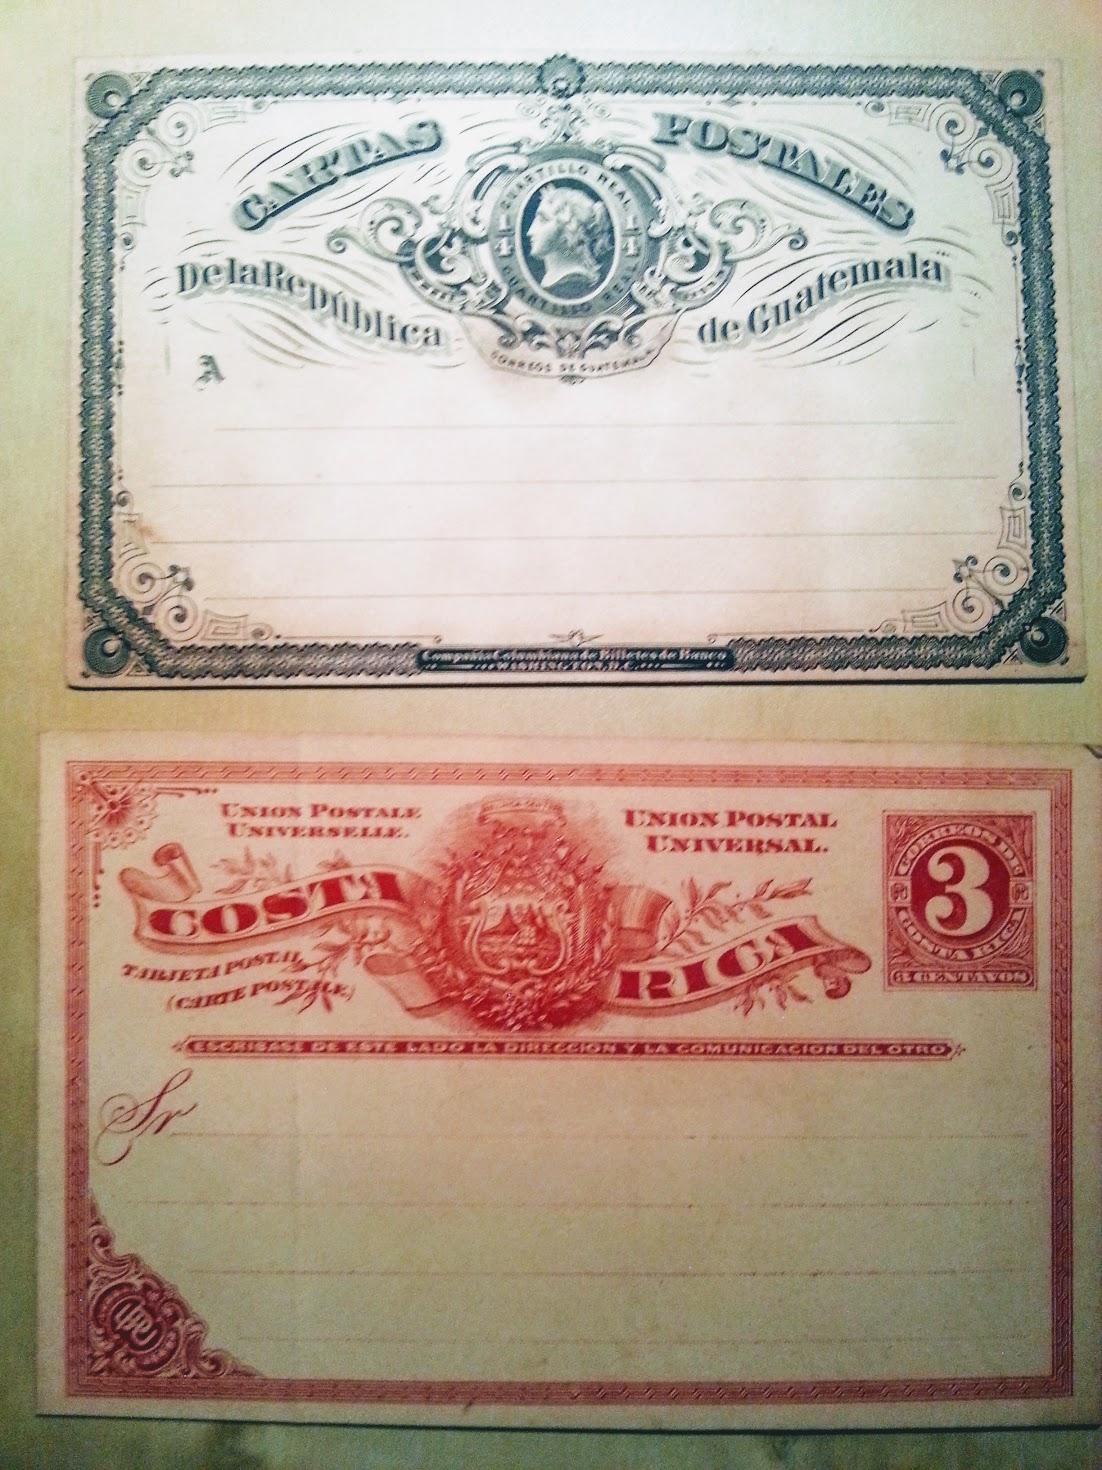 Cartas Postales, Tarjeta Postal